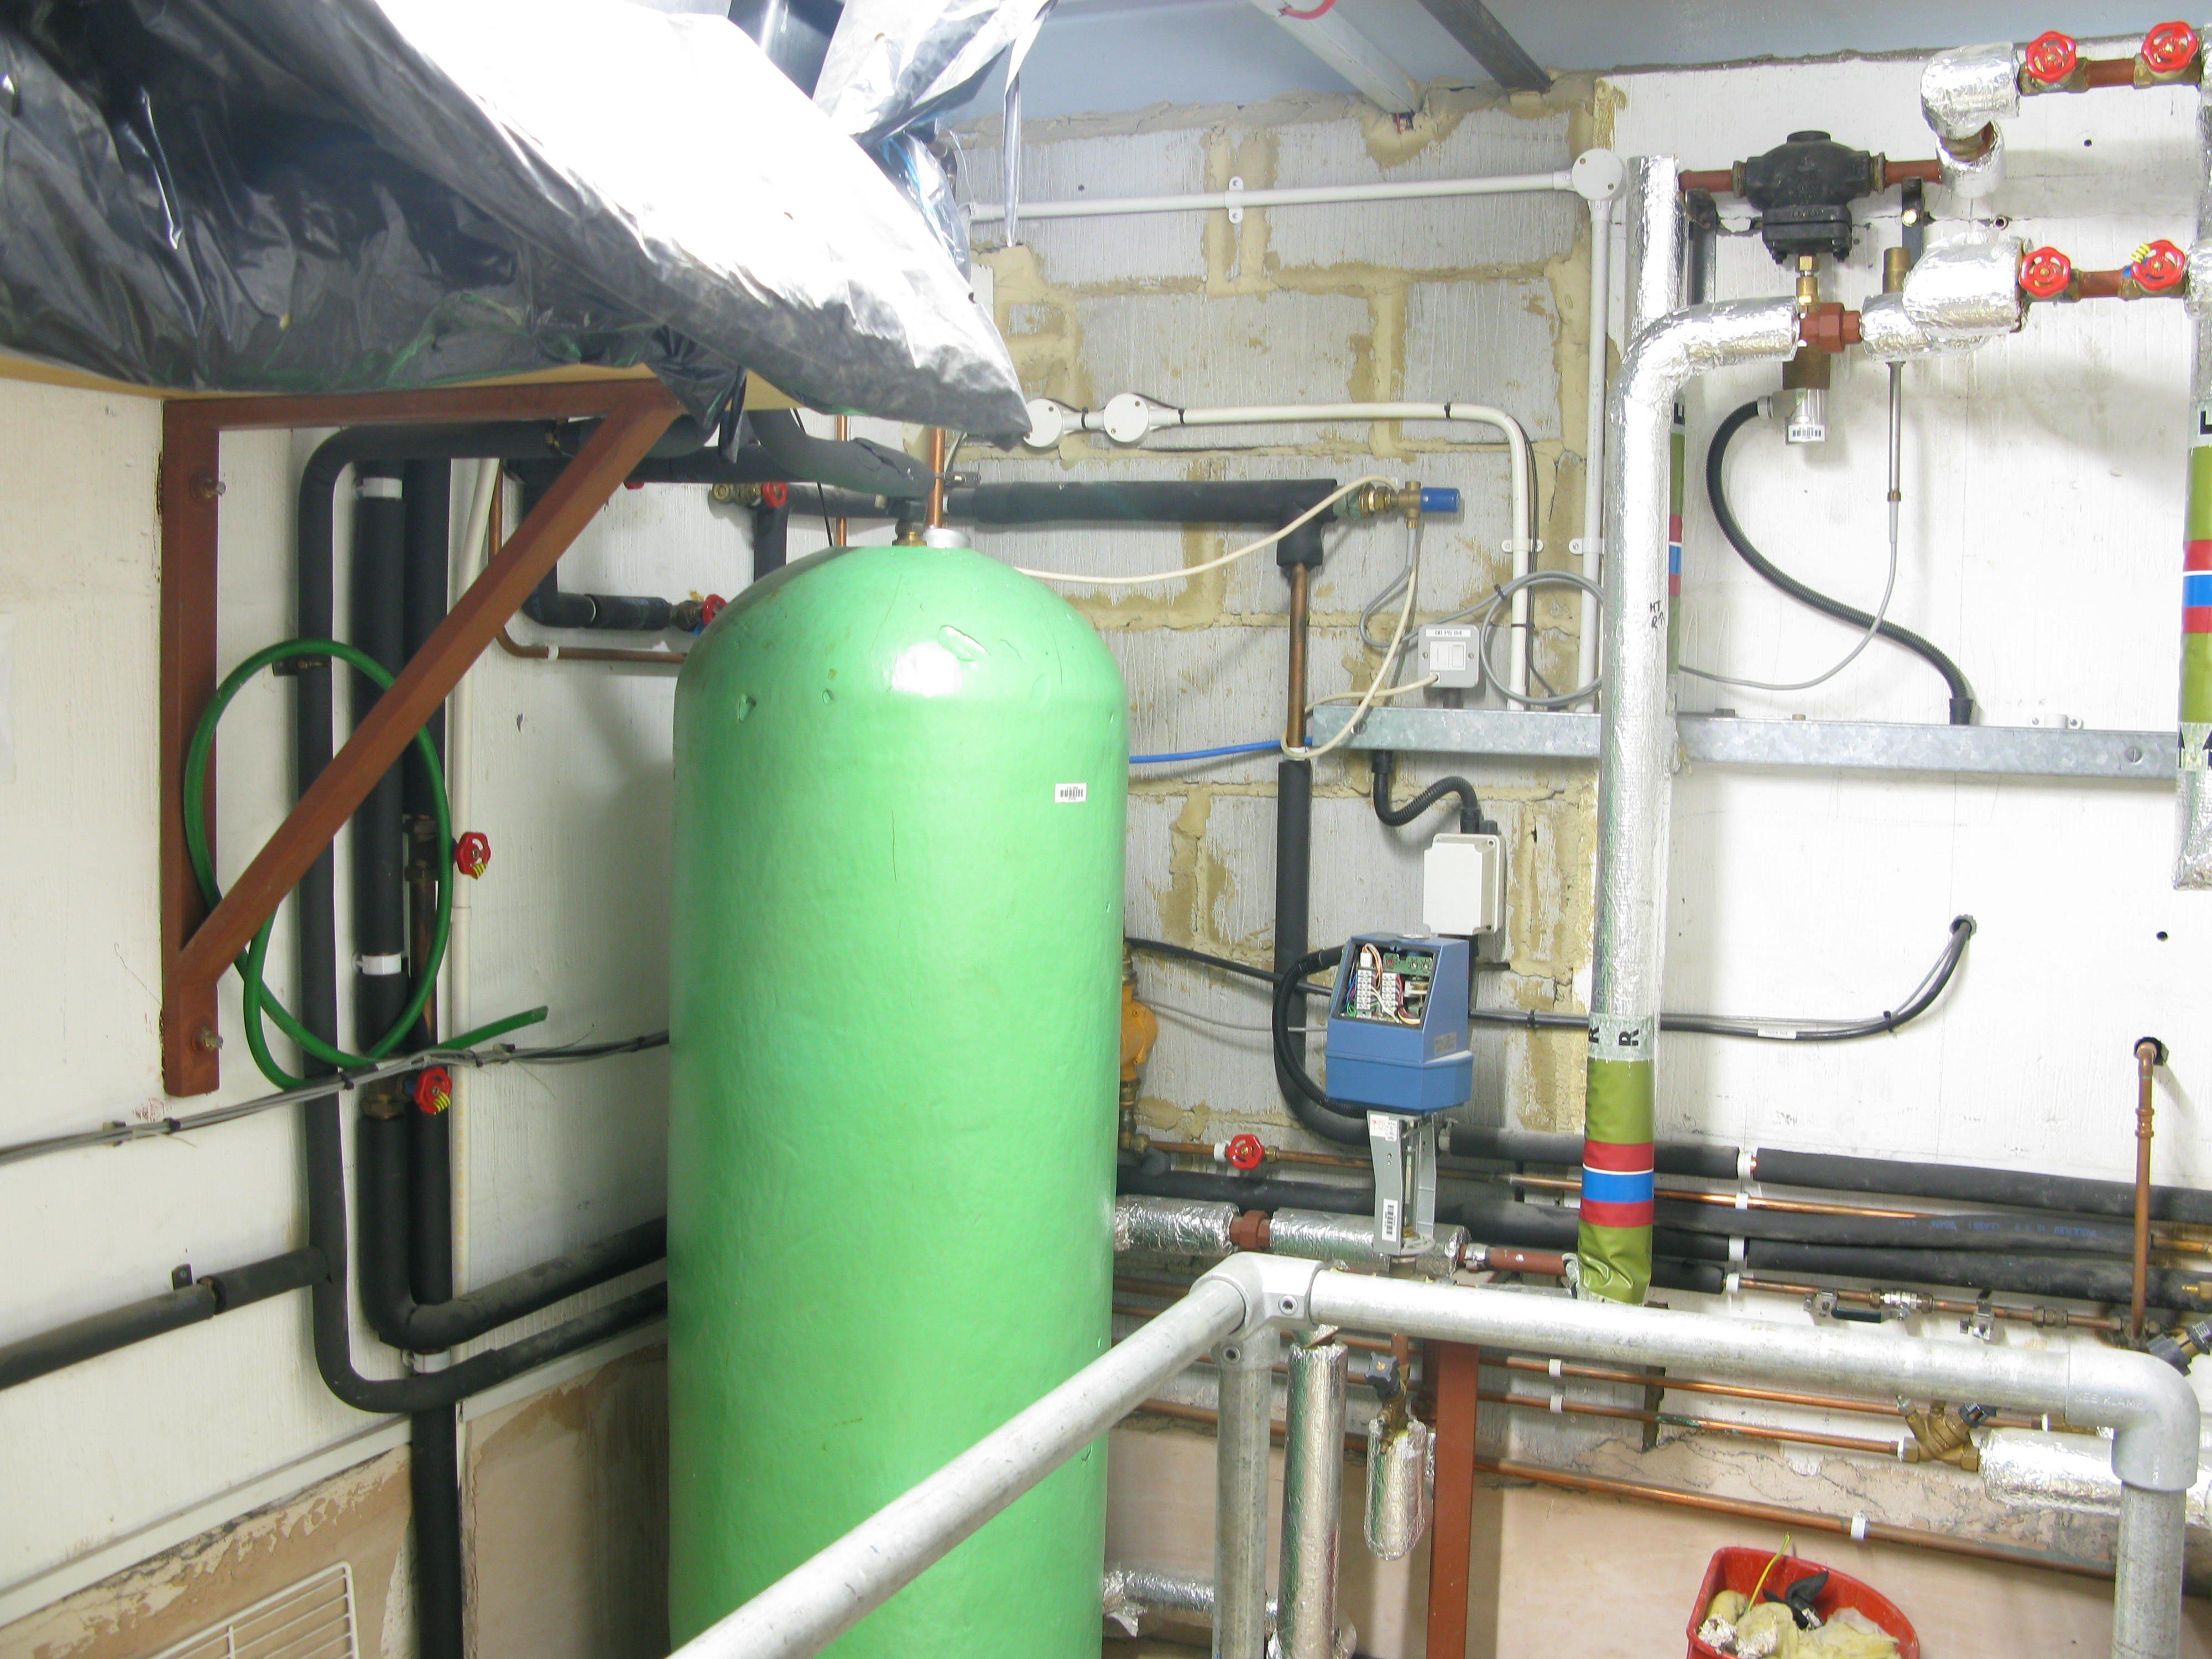 Services Block hot water calorifier